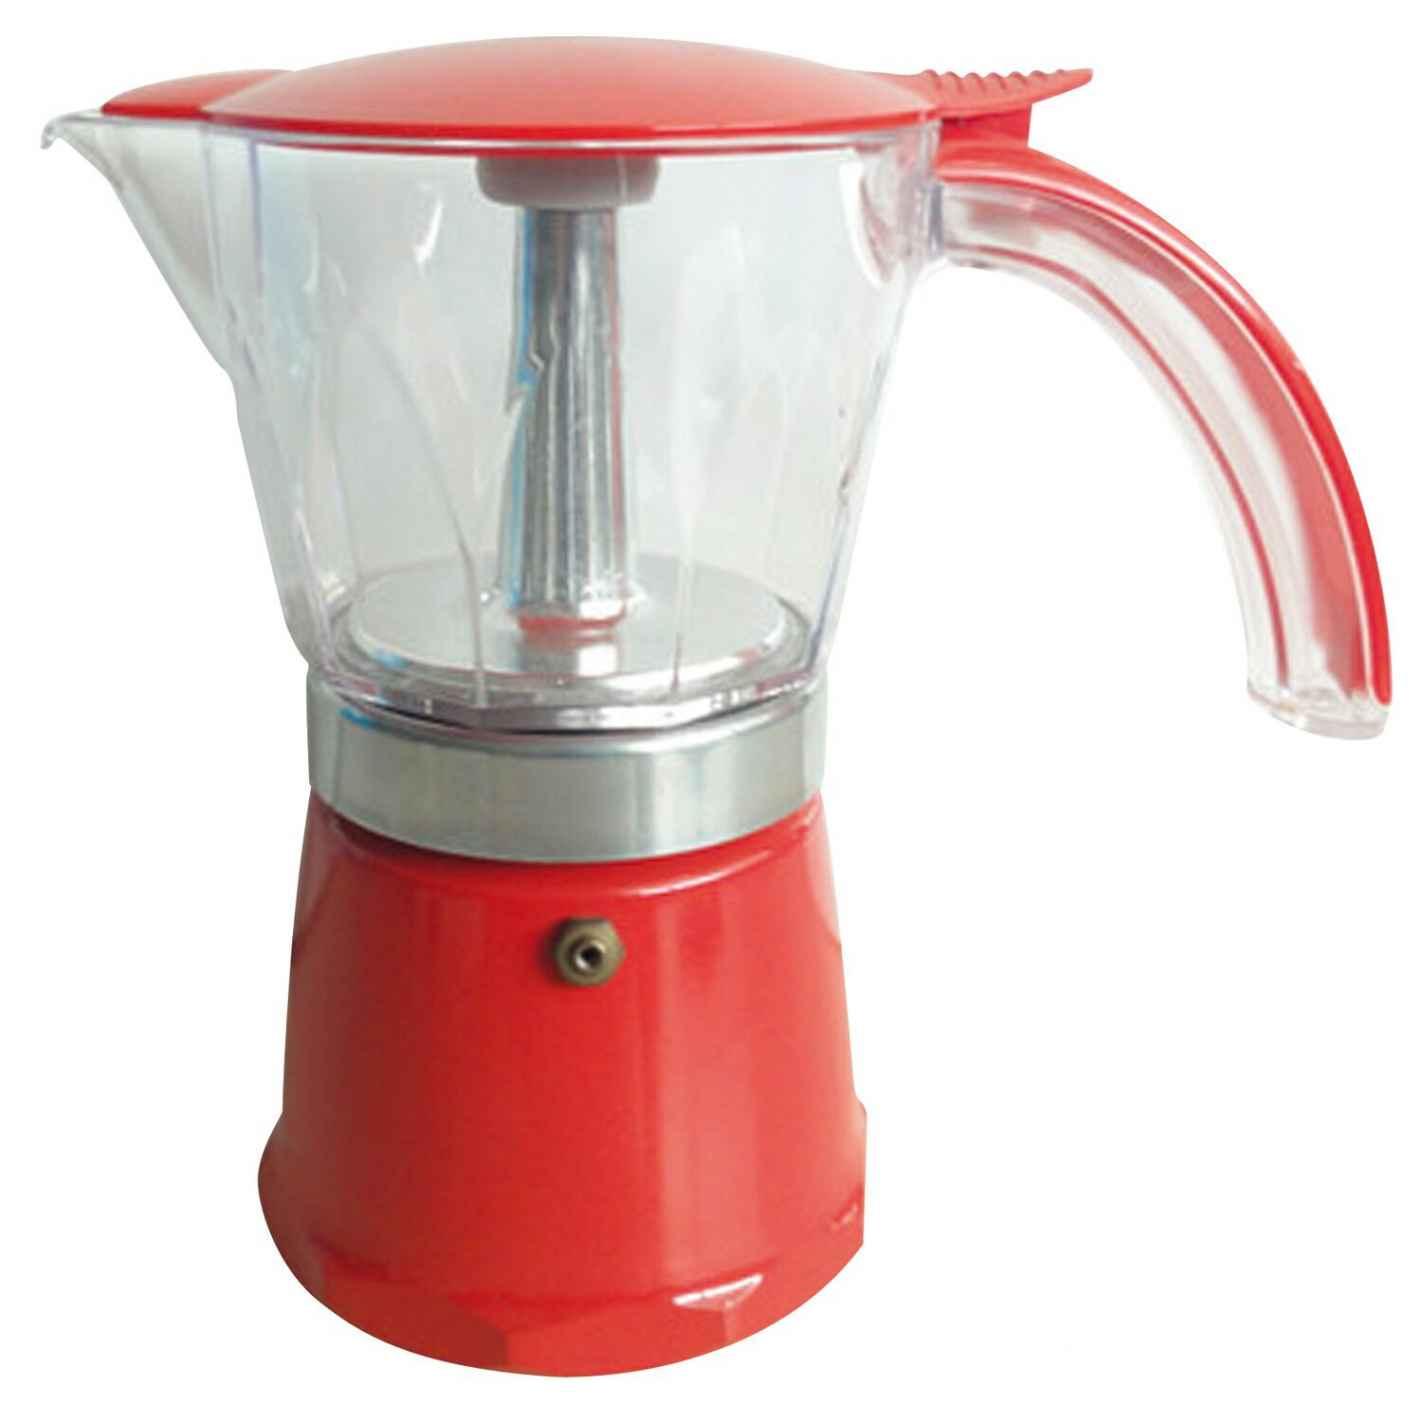 cafetière italienne rouge 6 tasses